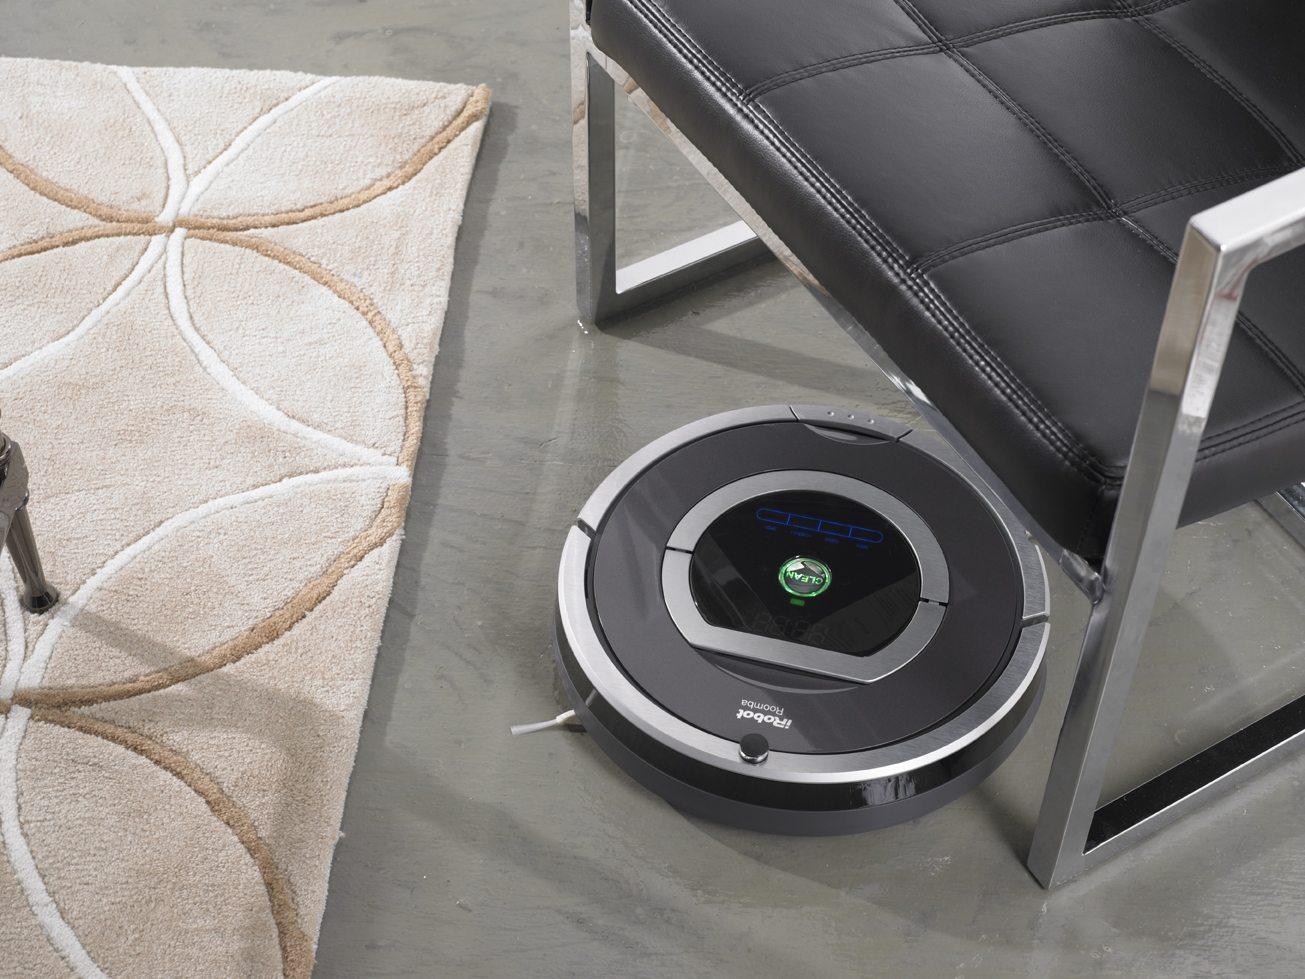 iRobot Roomba 770 Review